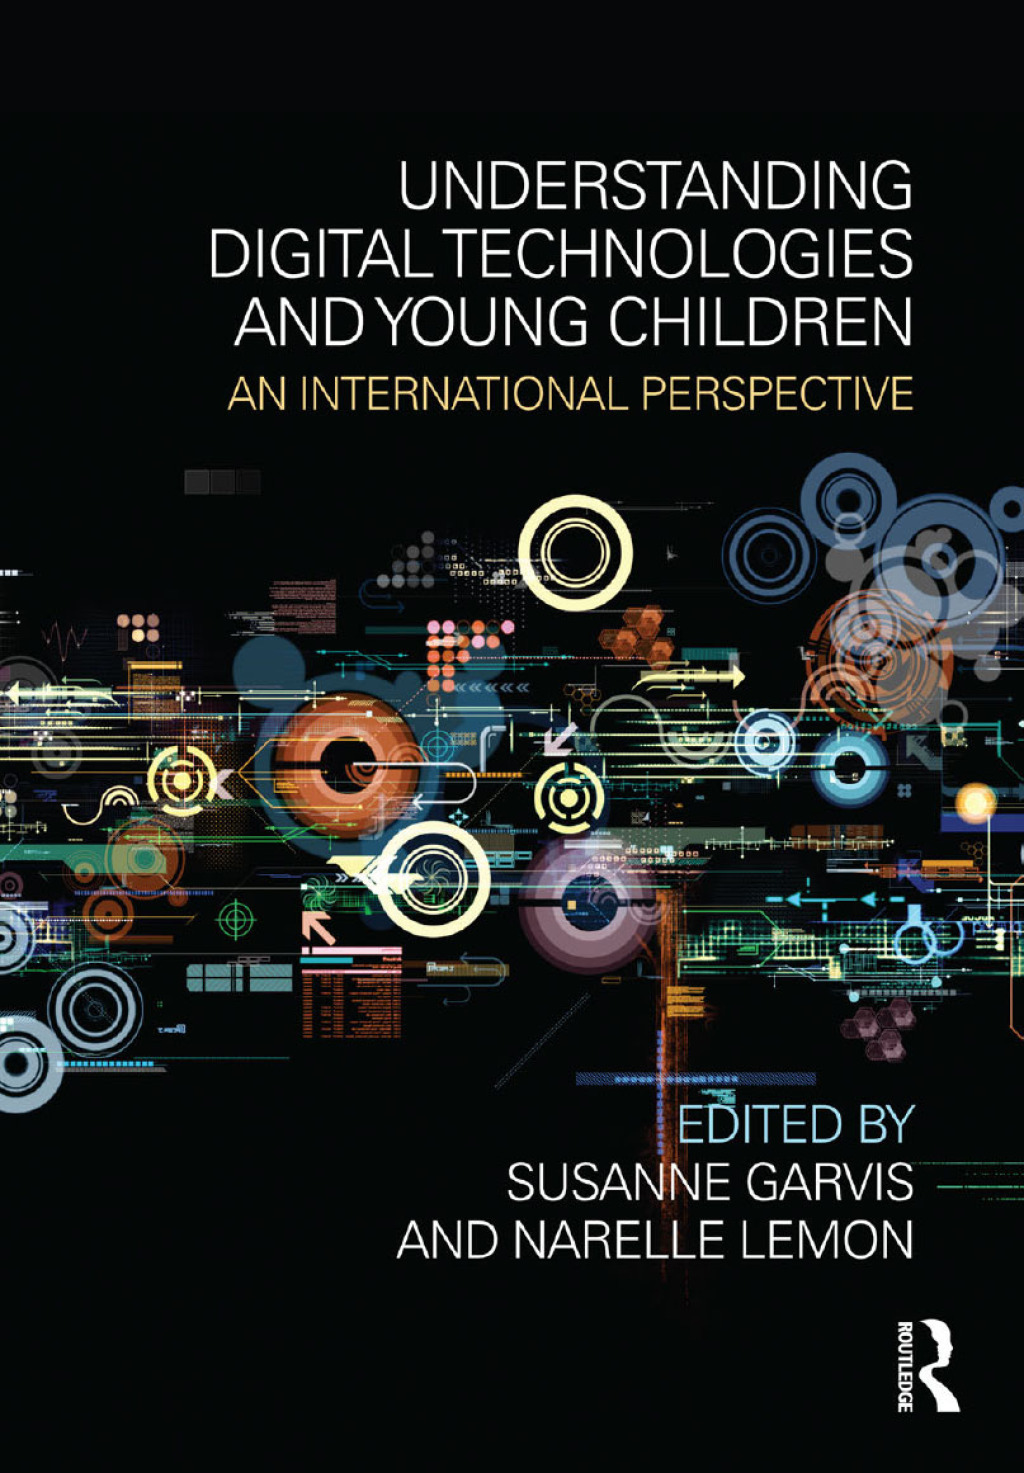 Understanding Digital Technologies and Young Children (eBook) (9781317619796) photo